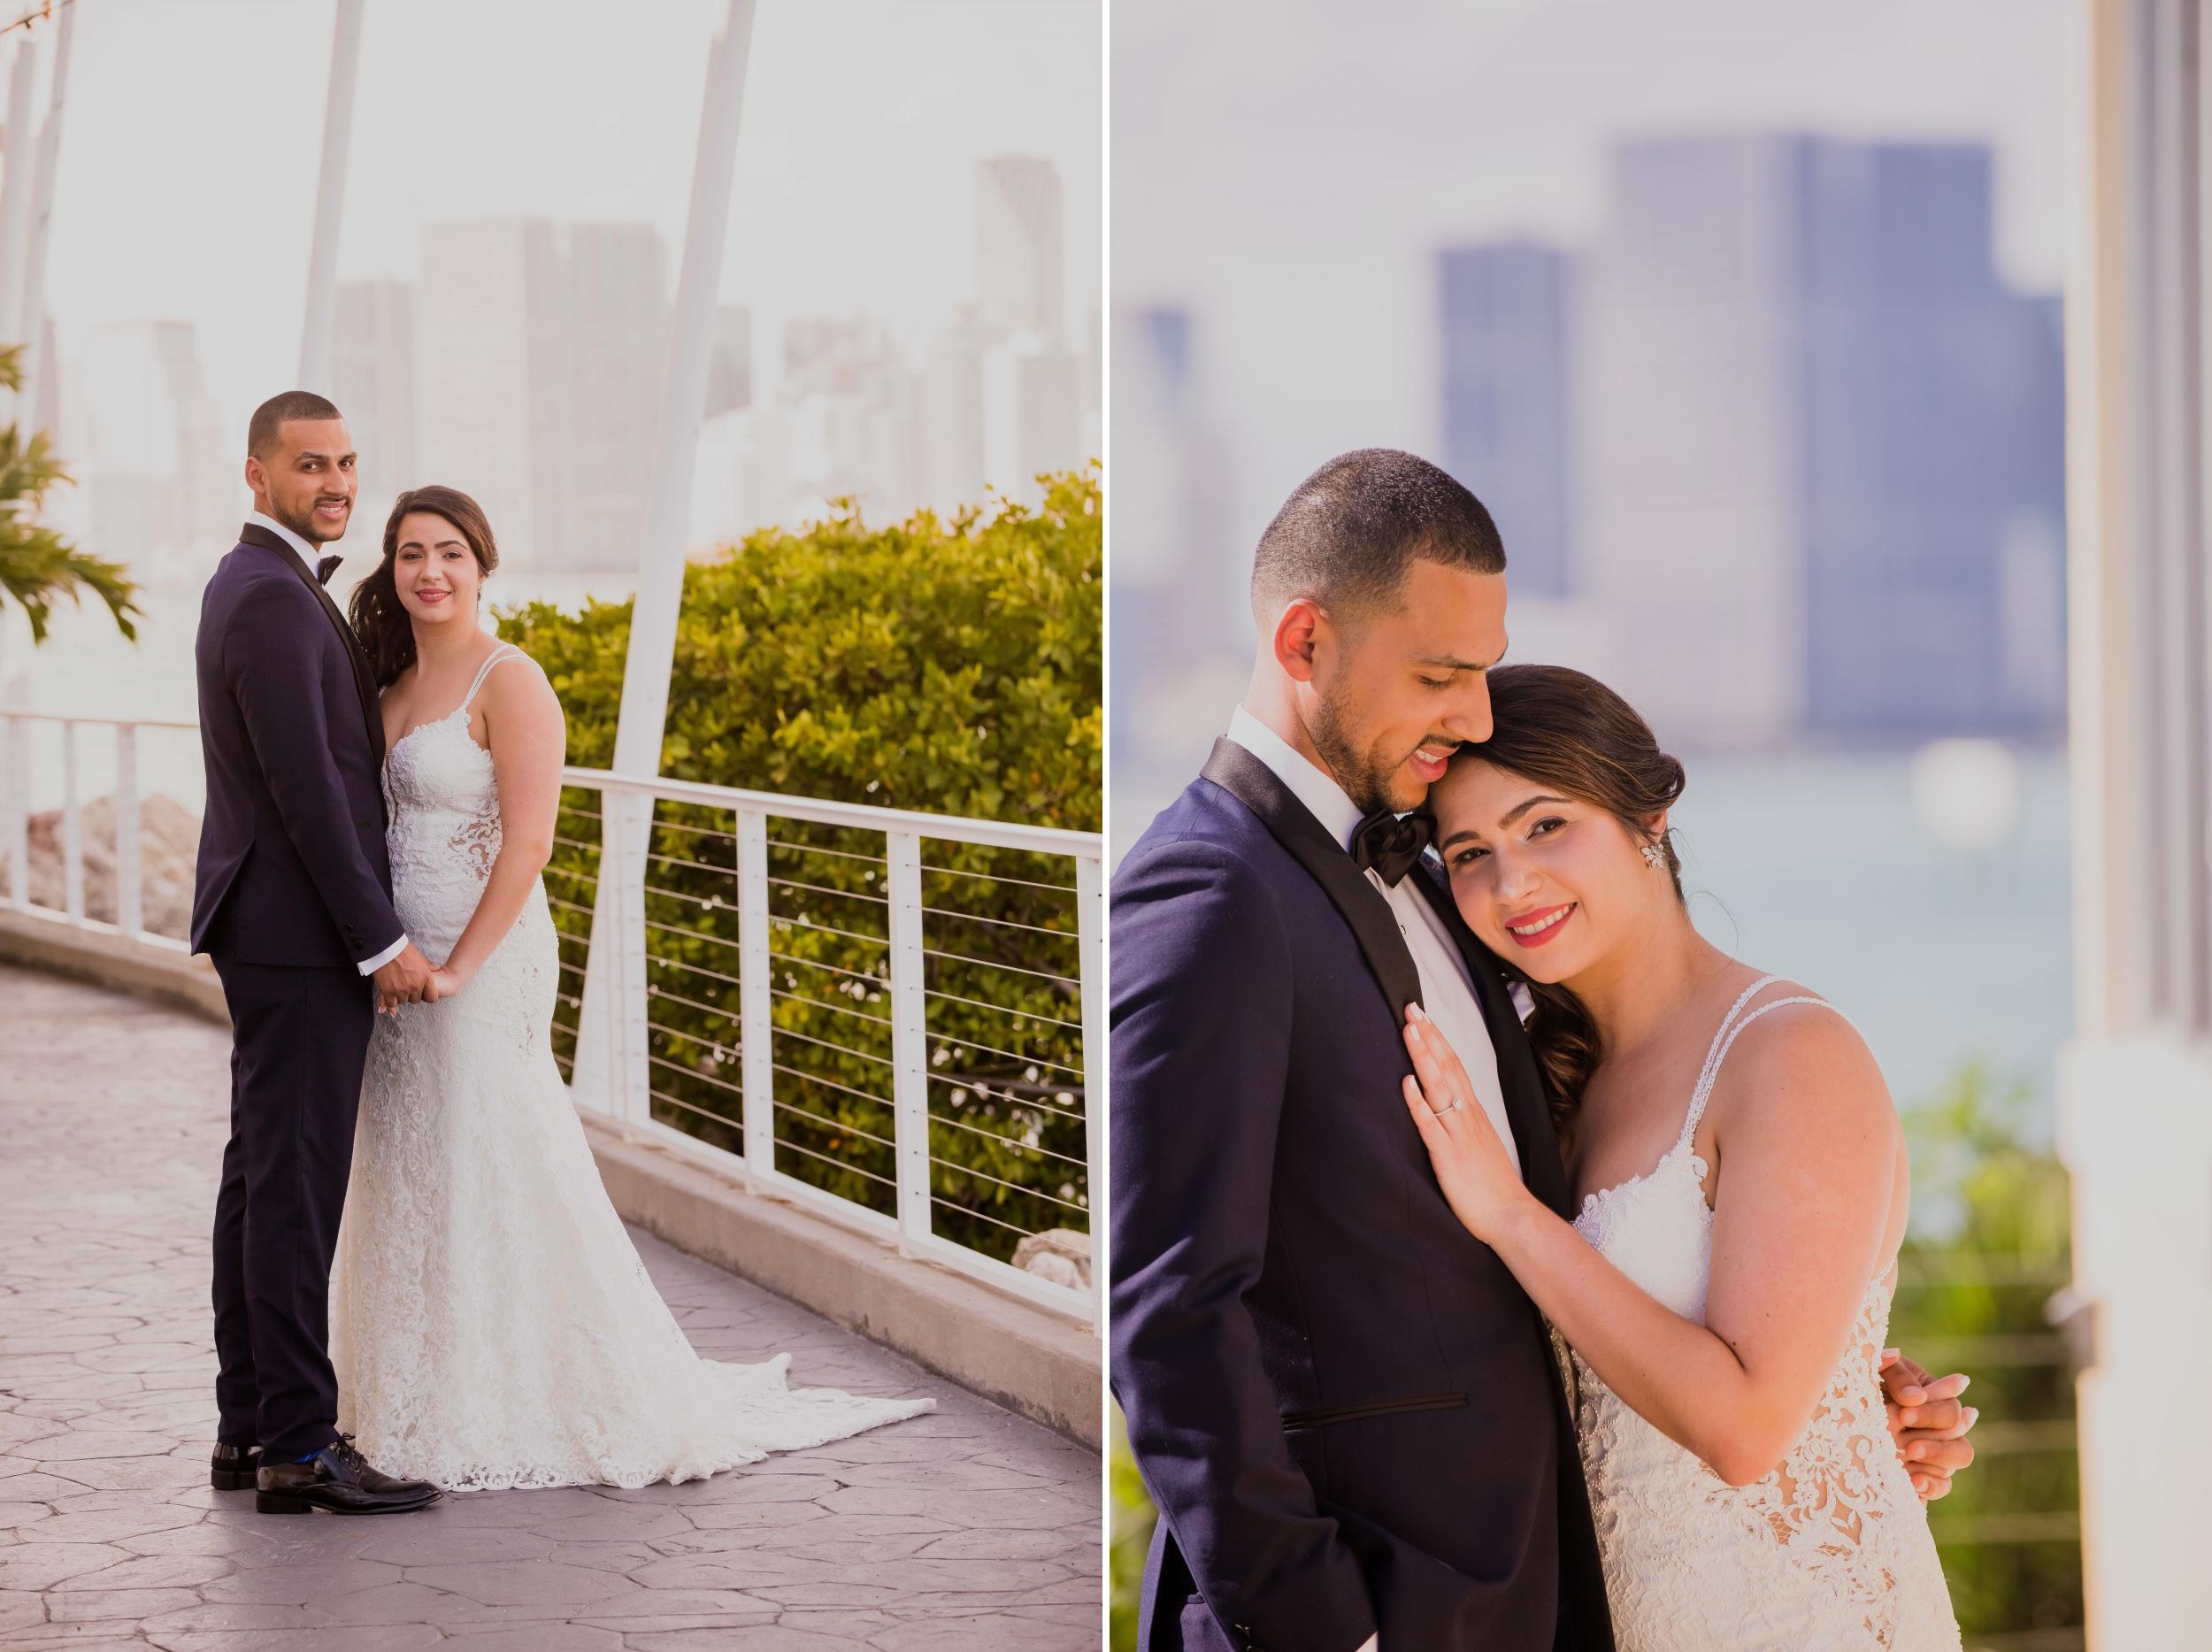 Wedding - Rusty Pelican - Key Biscayne - Santy Martinez Photography 23.jpg